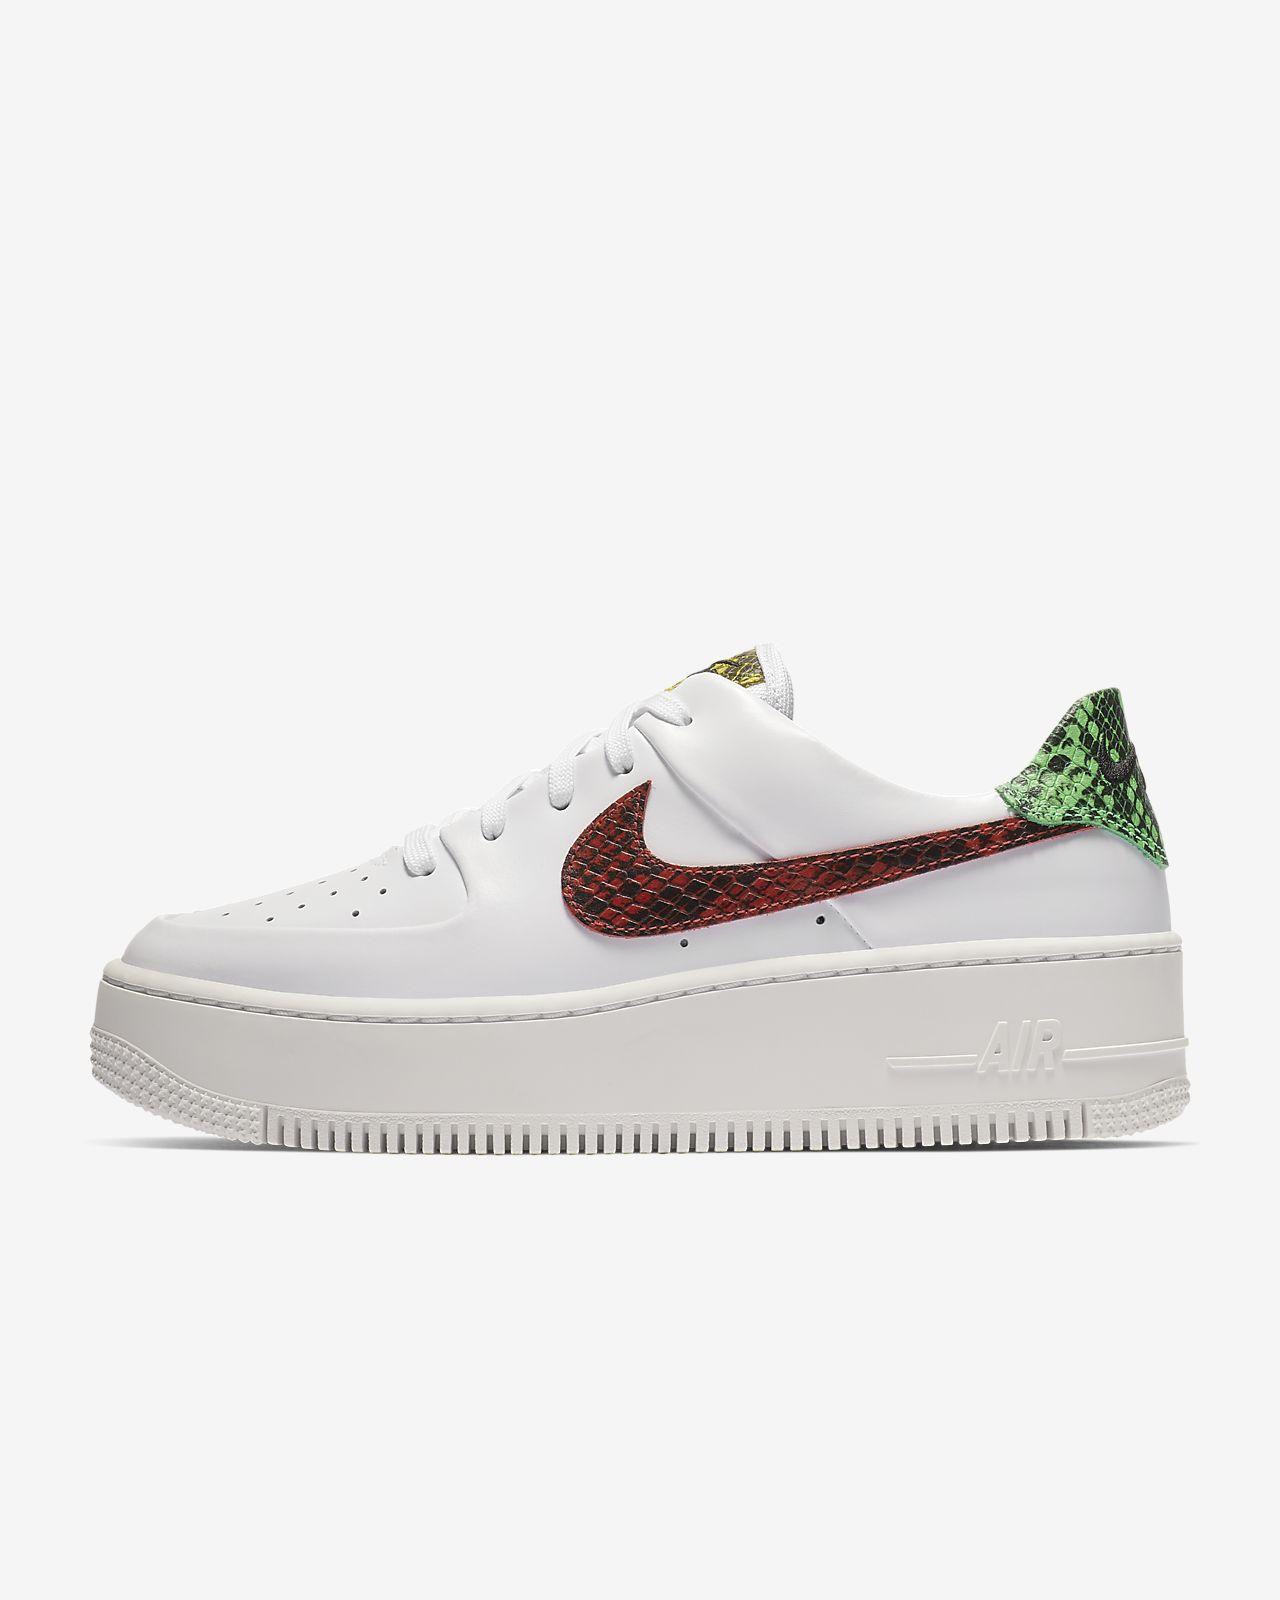 new style 71554 9f818 ... Nike Air Force 1 Sage Low Premium Animal-sko til kvinder